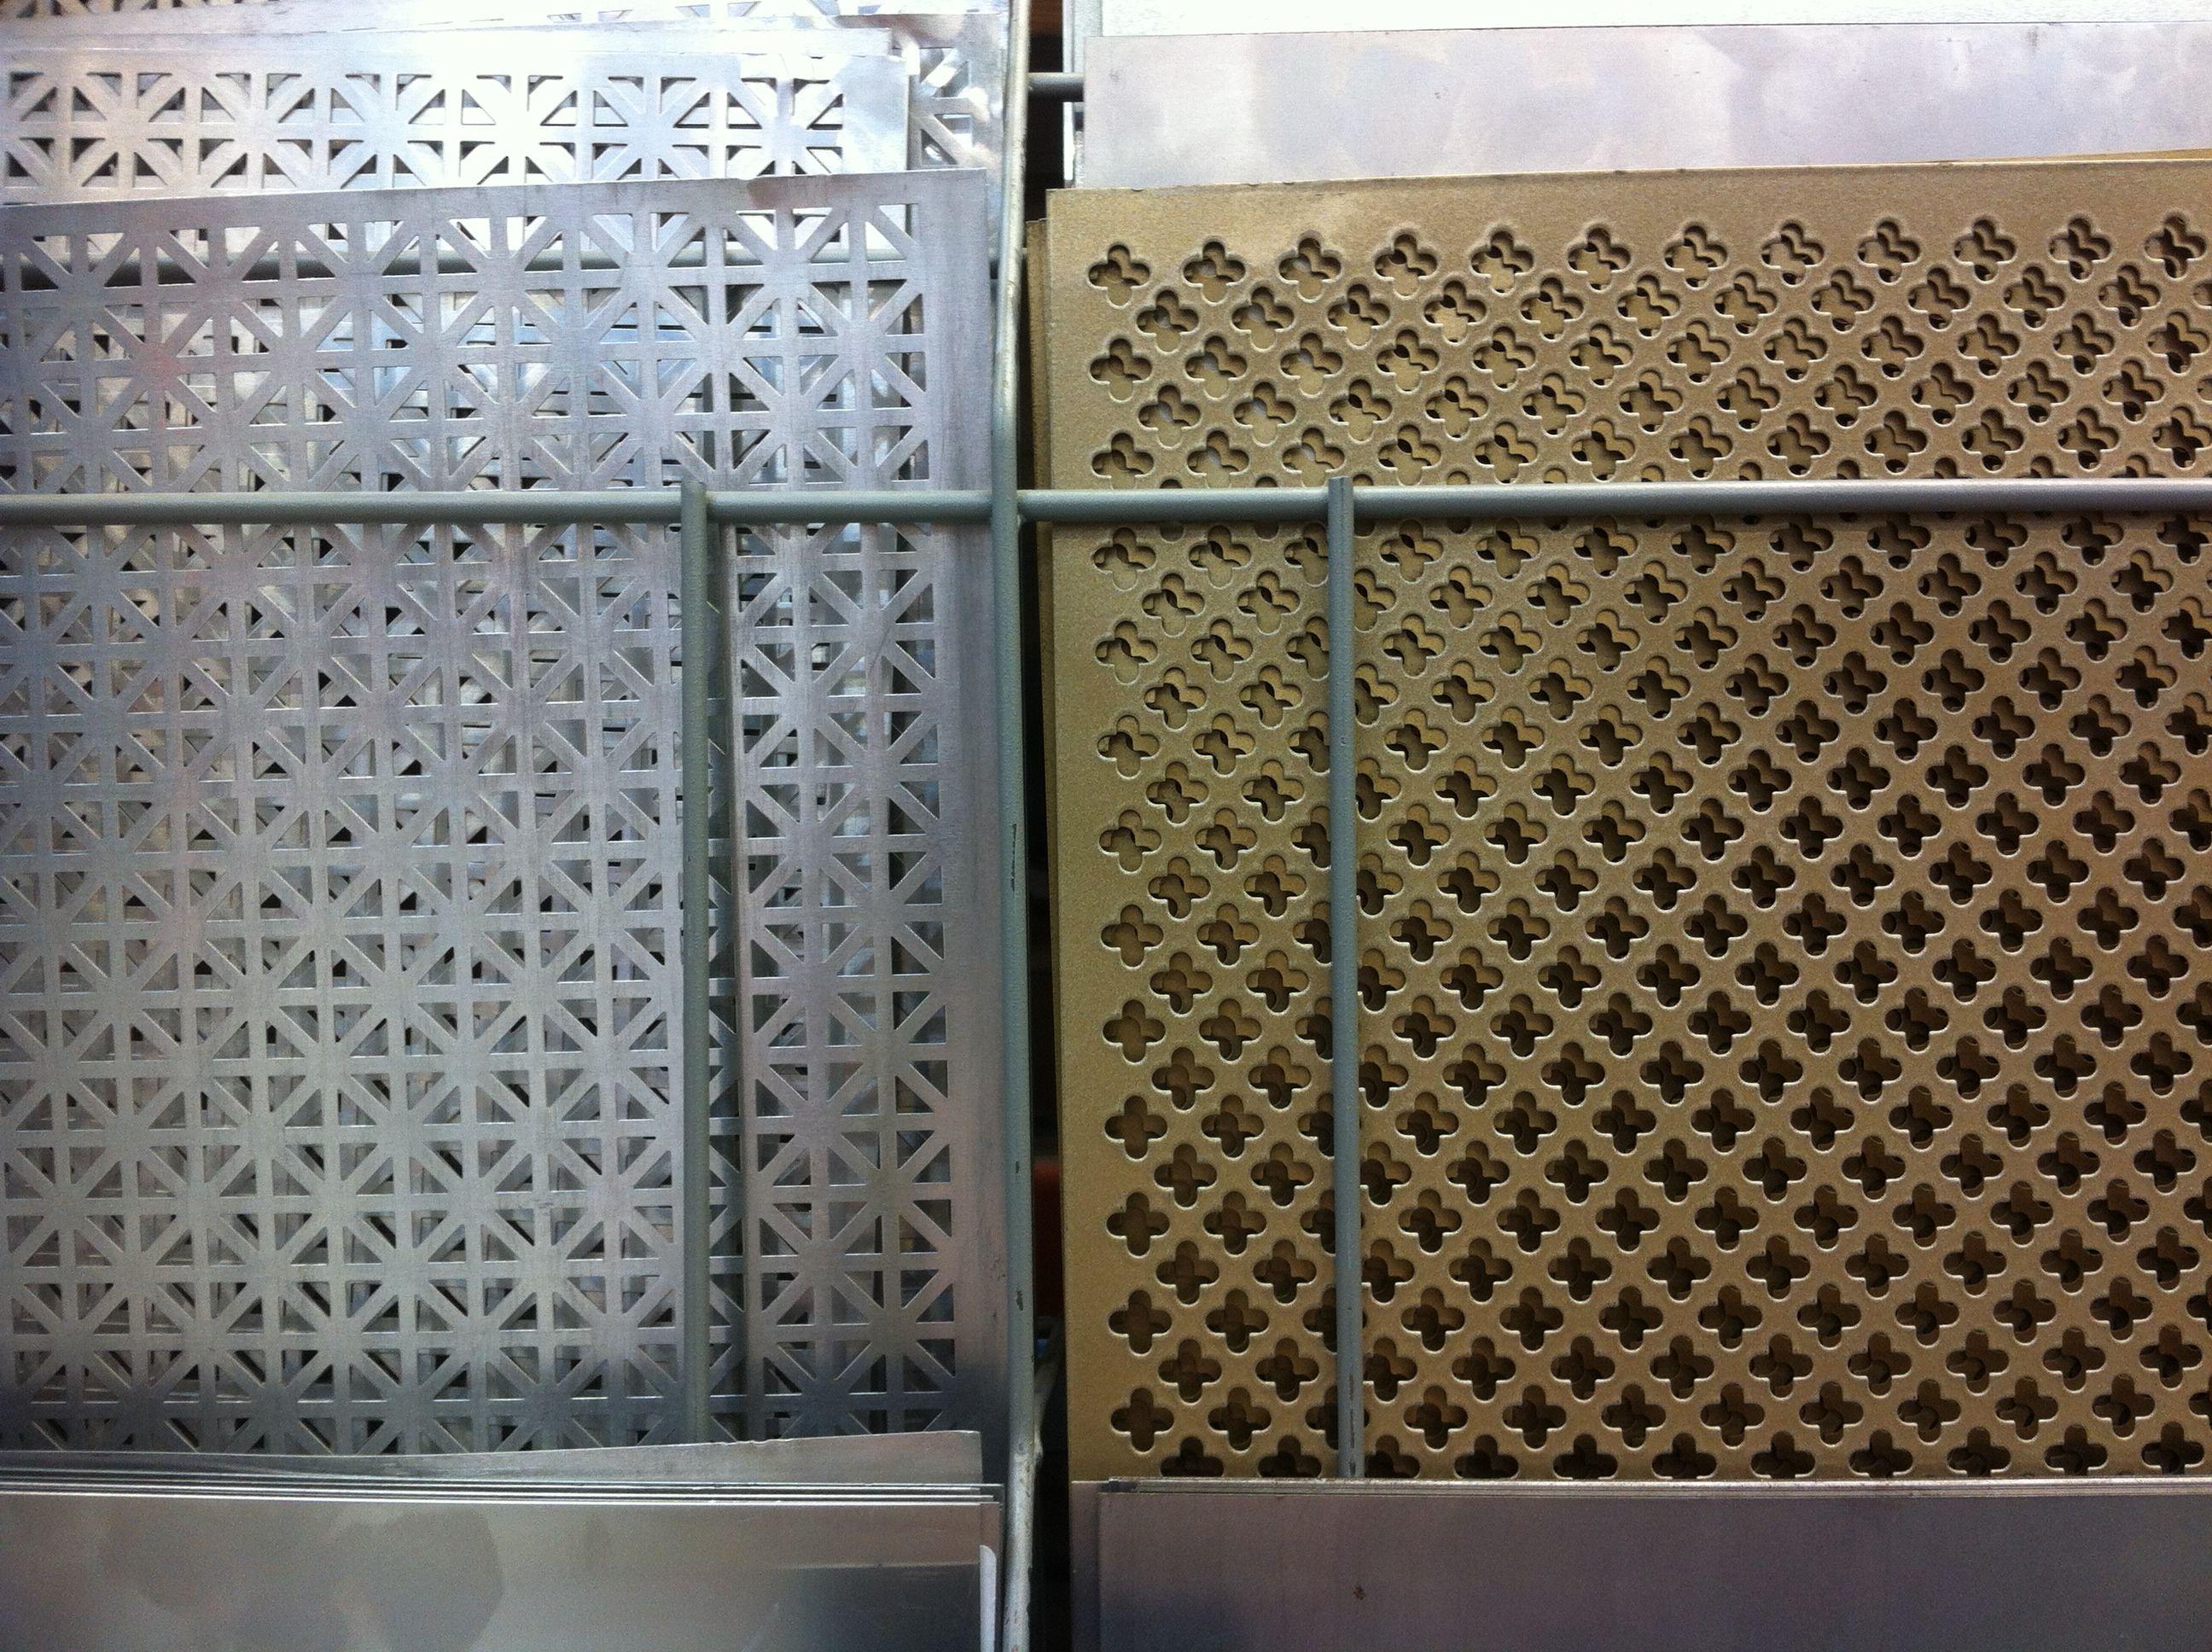 At Home Depot Radiator Covers Visiteurope Uat